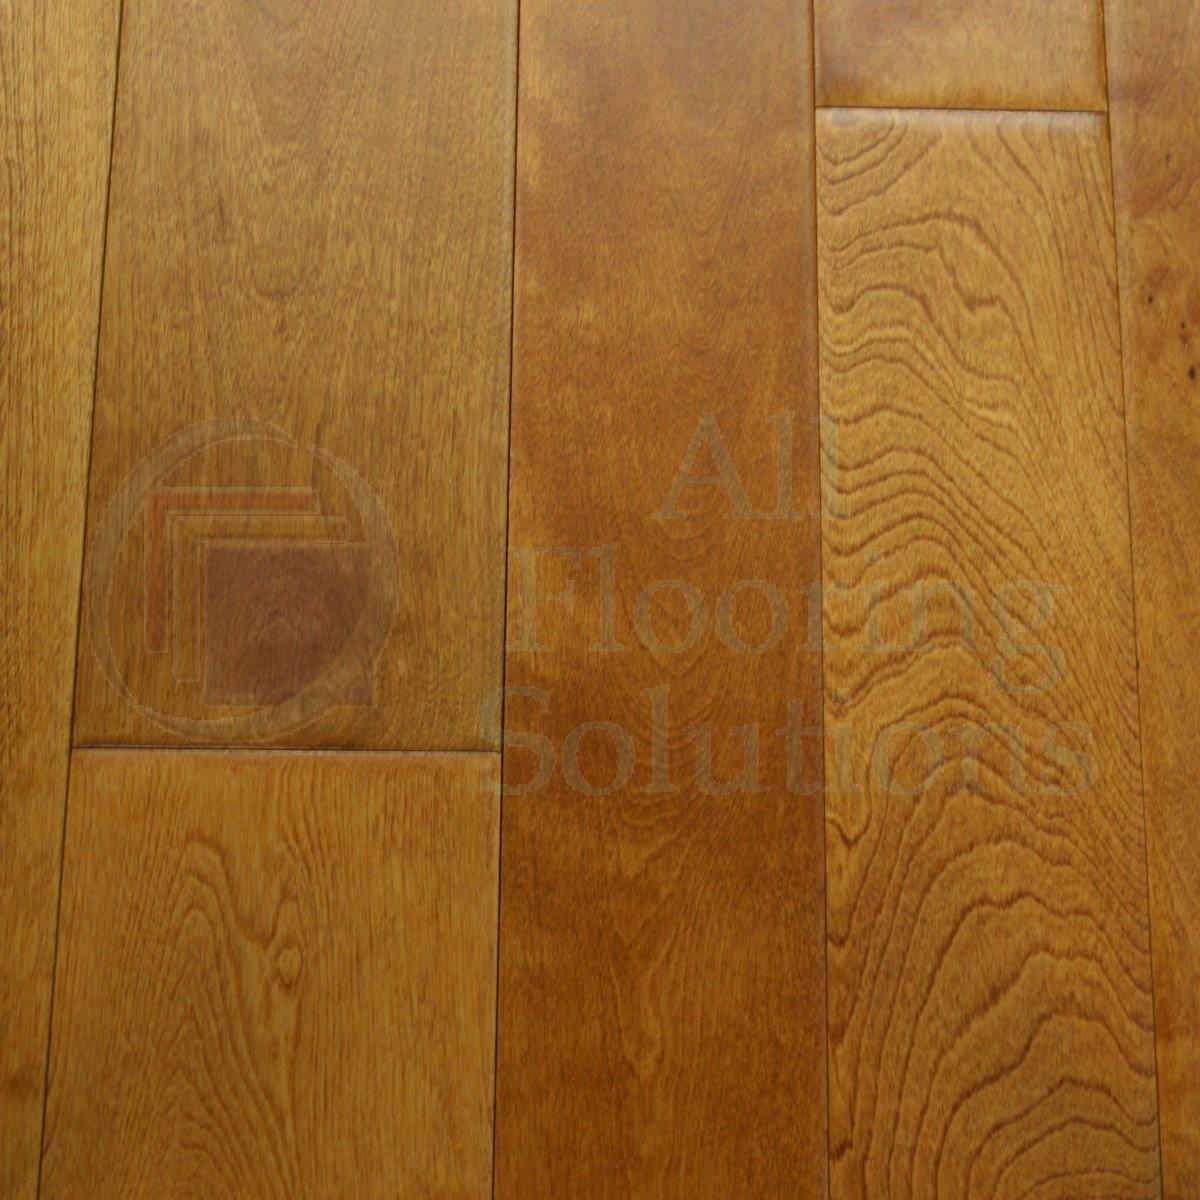 best canadian hardwood flooring manufacturers of 17 best of engineered hardwood vs solid collection dizpos com within engineered hardwood vs solid fresh engineered hardwood floor flooring america wholesale hardwood photograph of 17 best